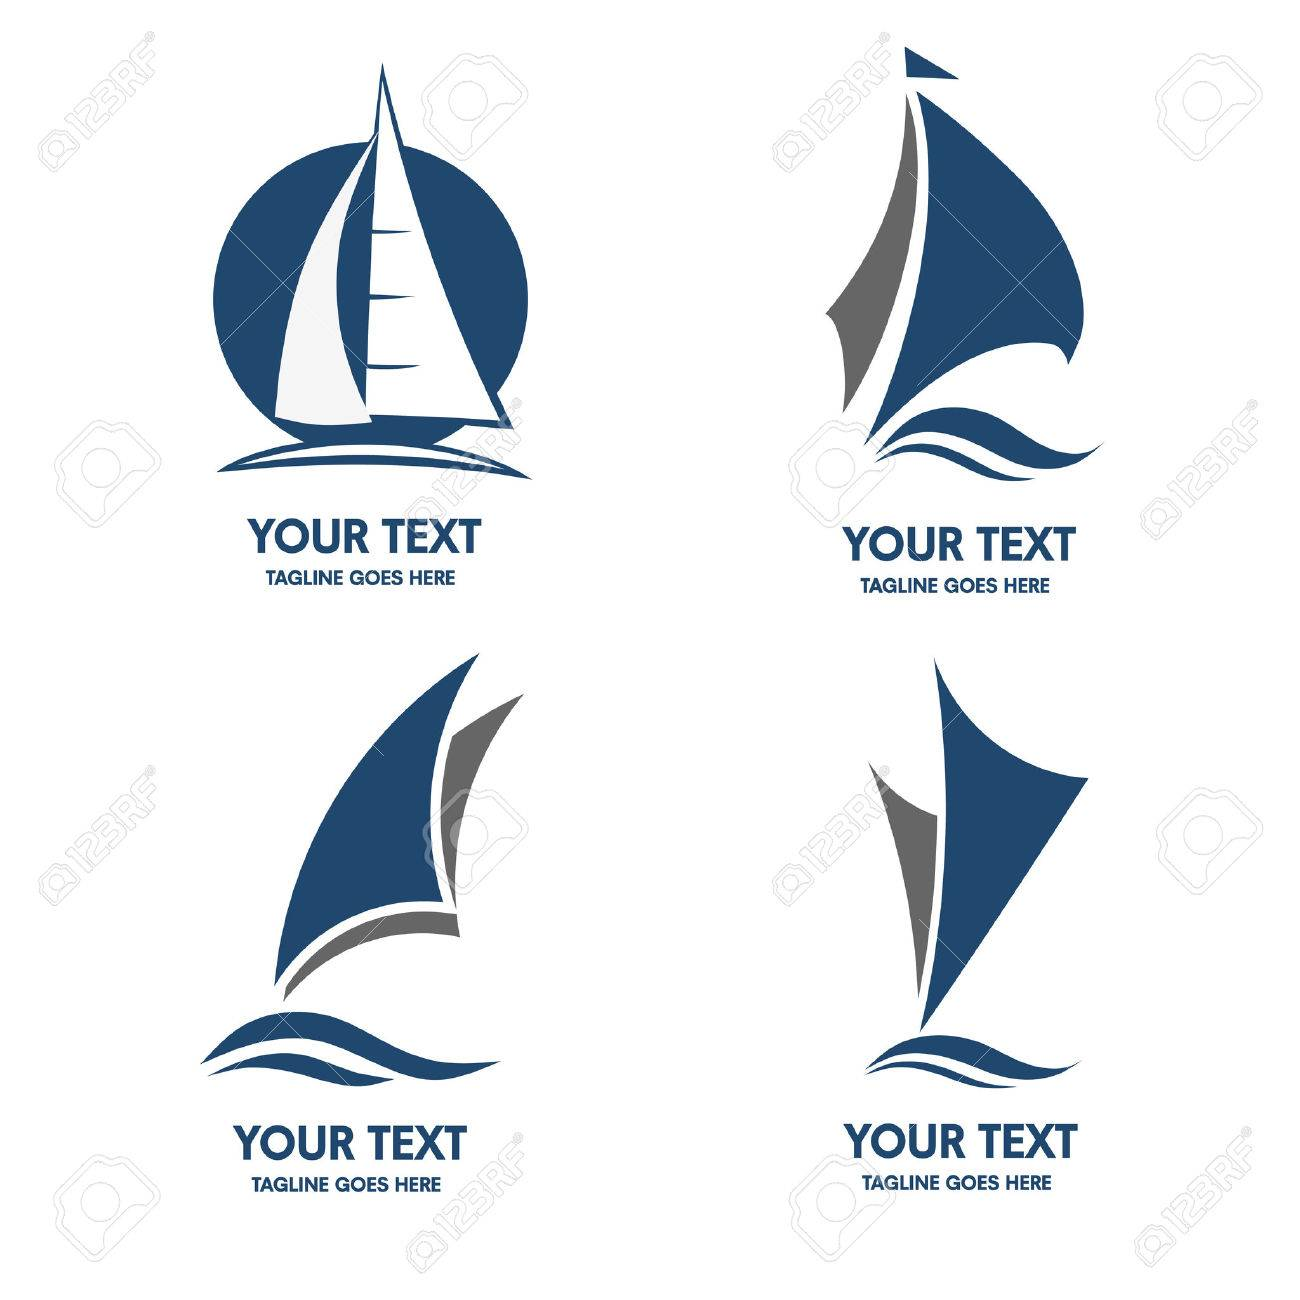 Sailing boat icon - 55080150